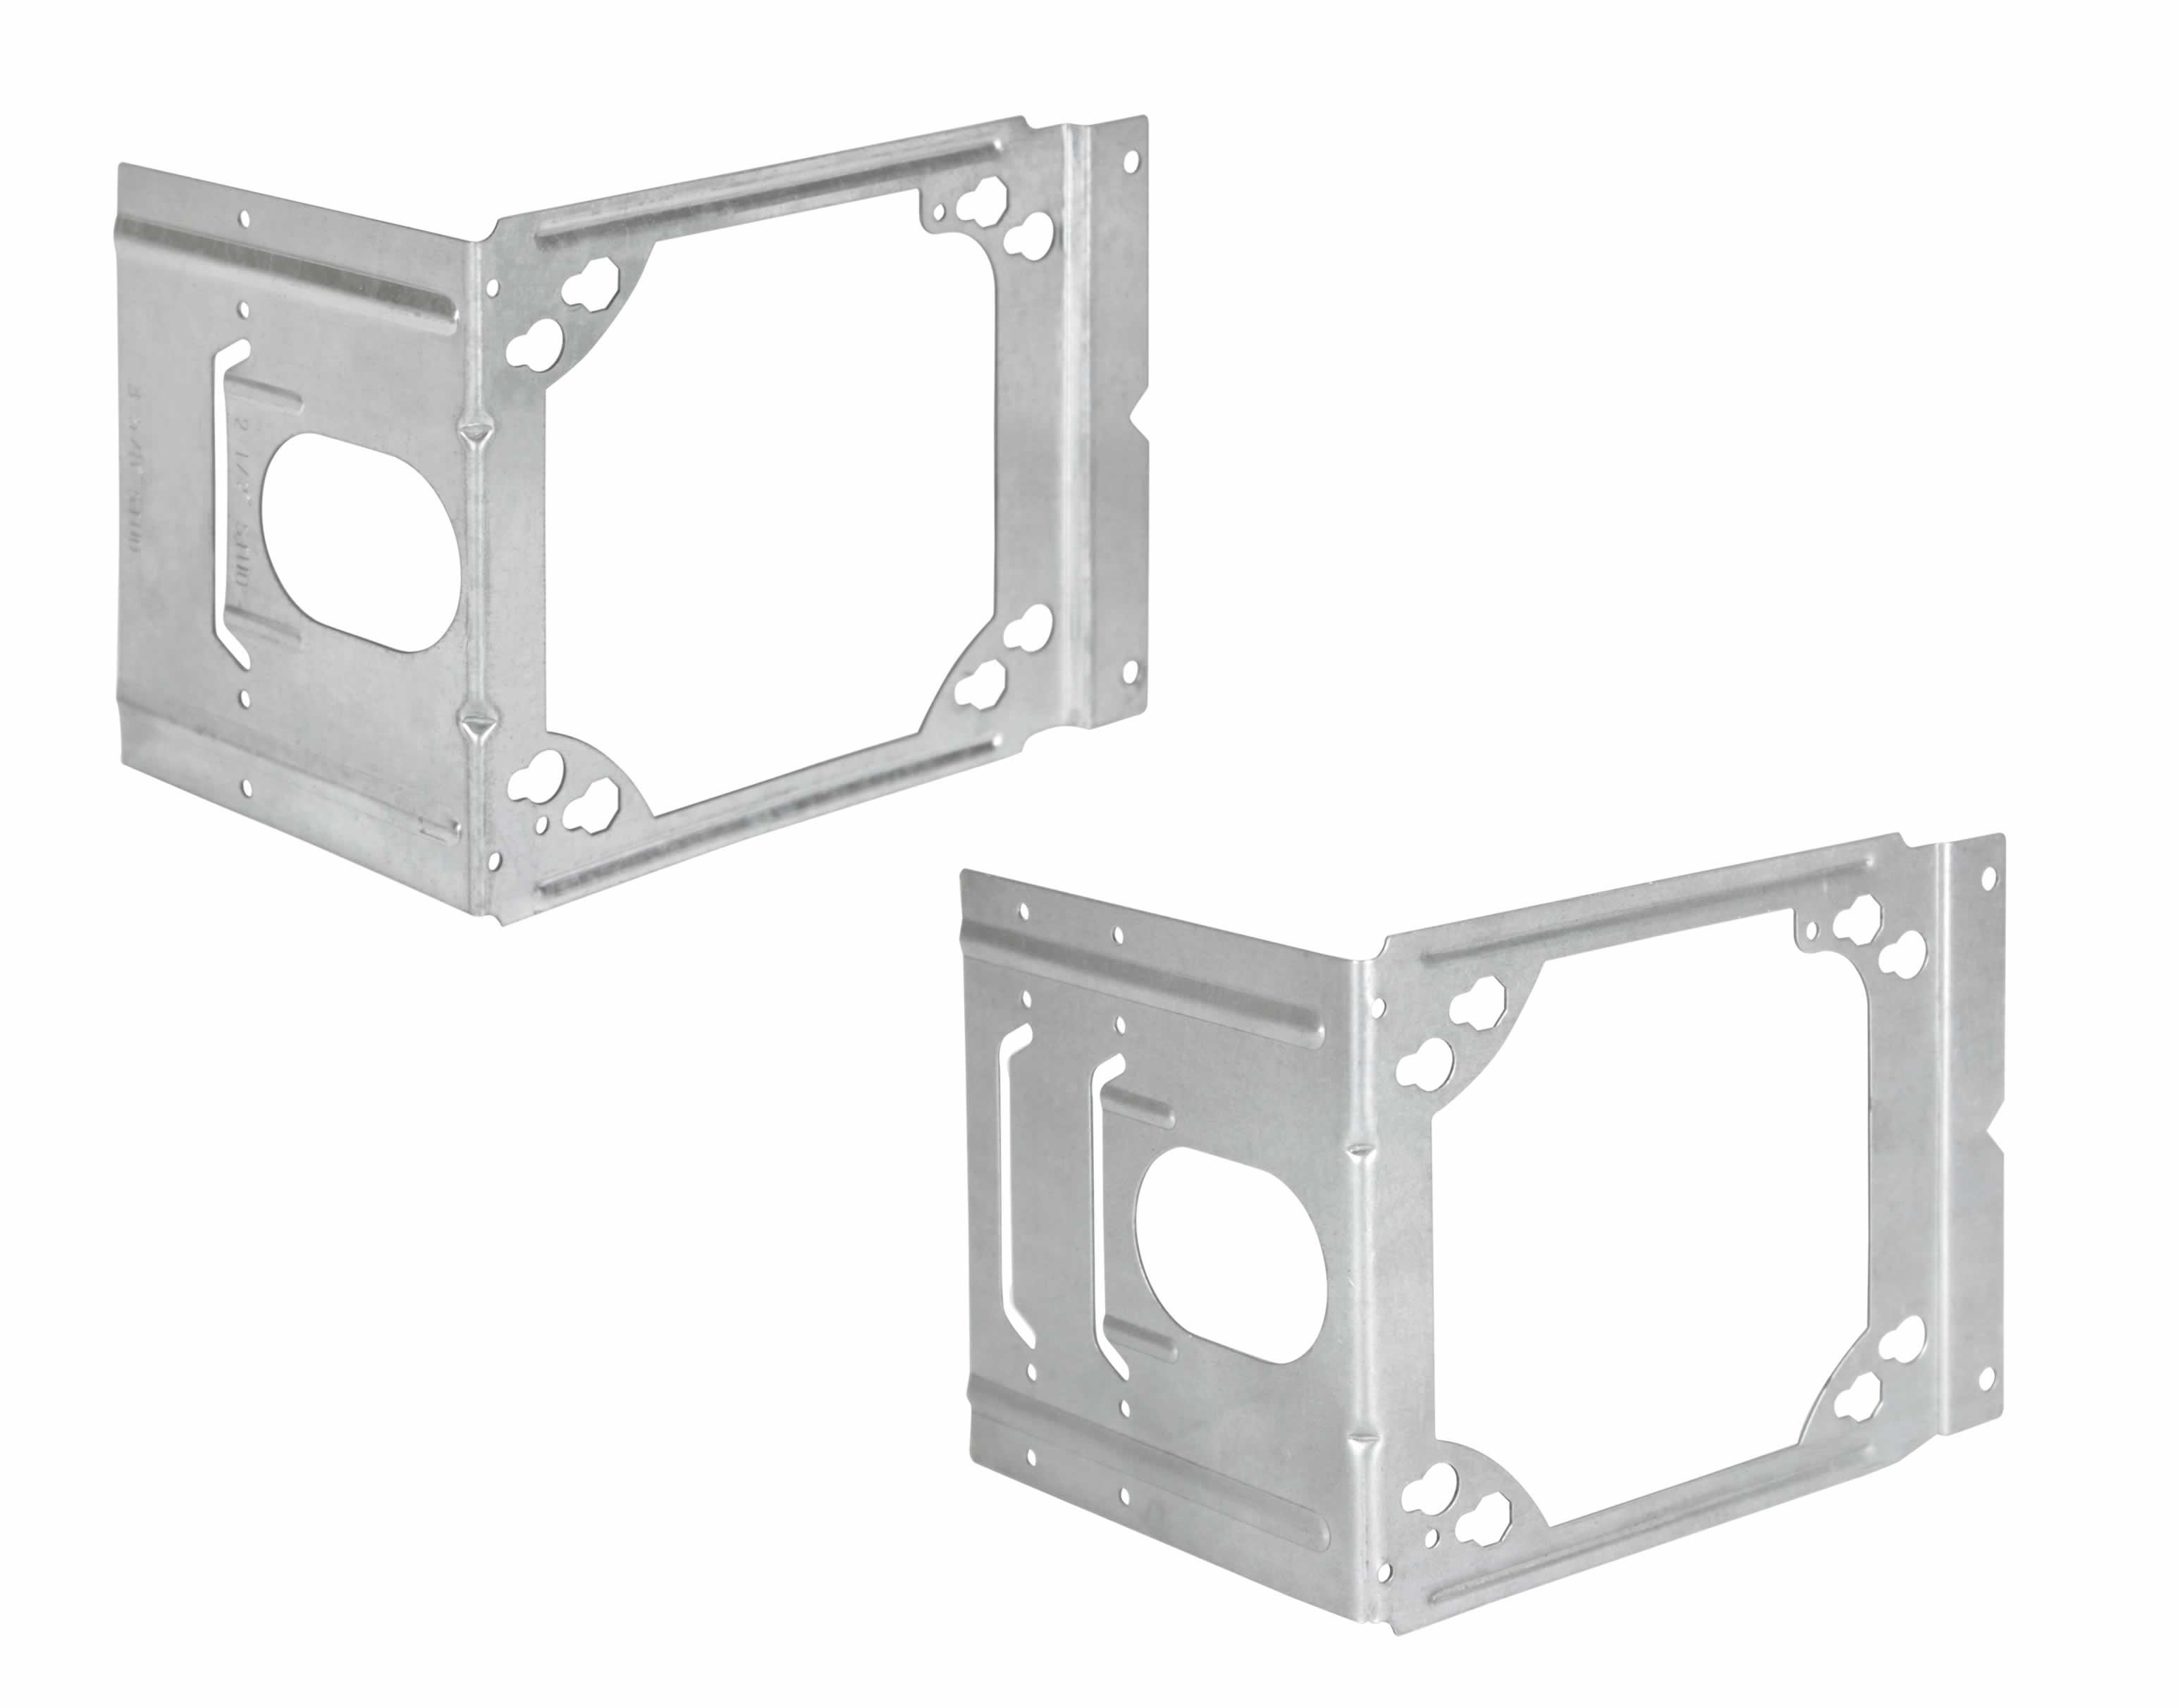 Box Mounting Adapter